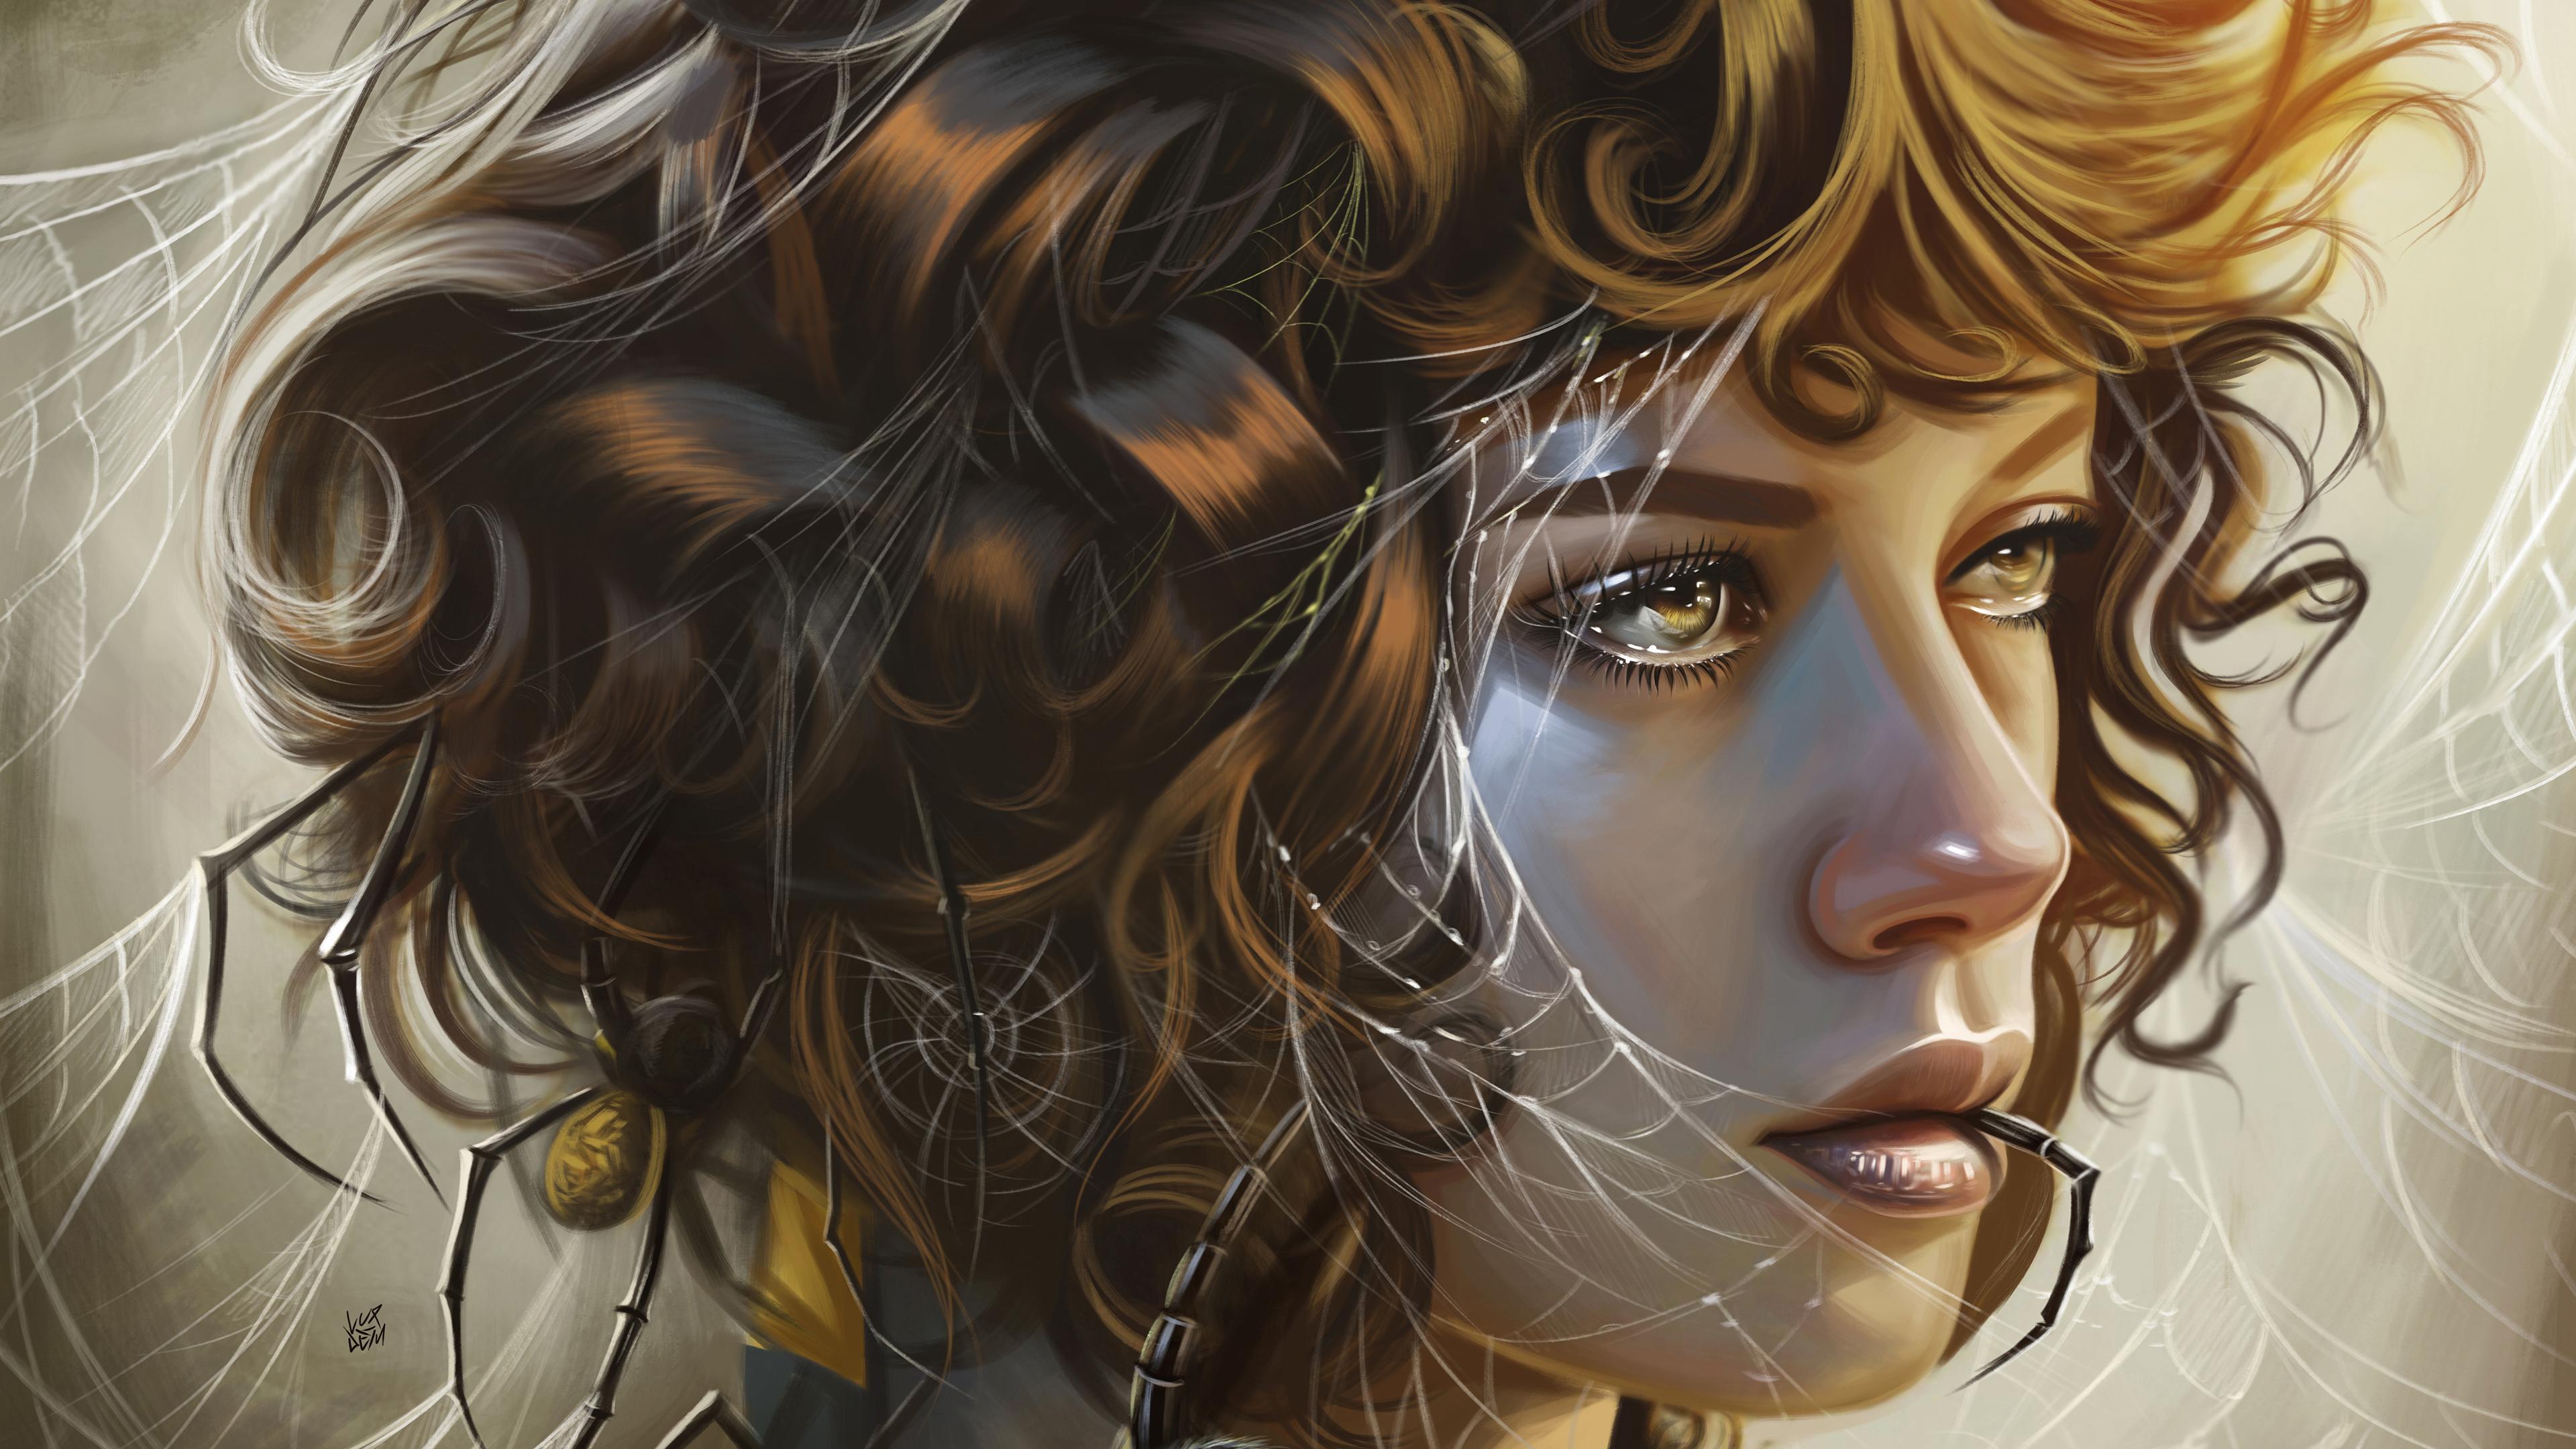 graphic design girl art 4k 1541970913 - Graphic Design Girl Art 4k - hd-wallpapers, digital art wallpapers, behance wallpapers, artwork wallpapers, artist wallpapers, 4k-wallpapers